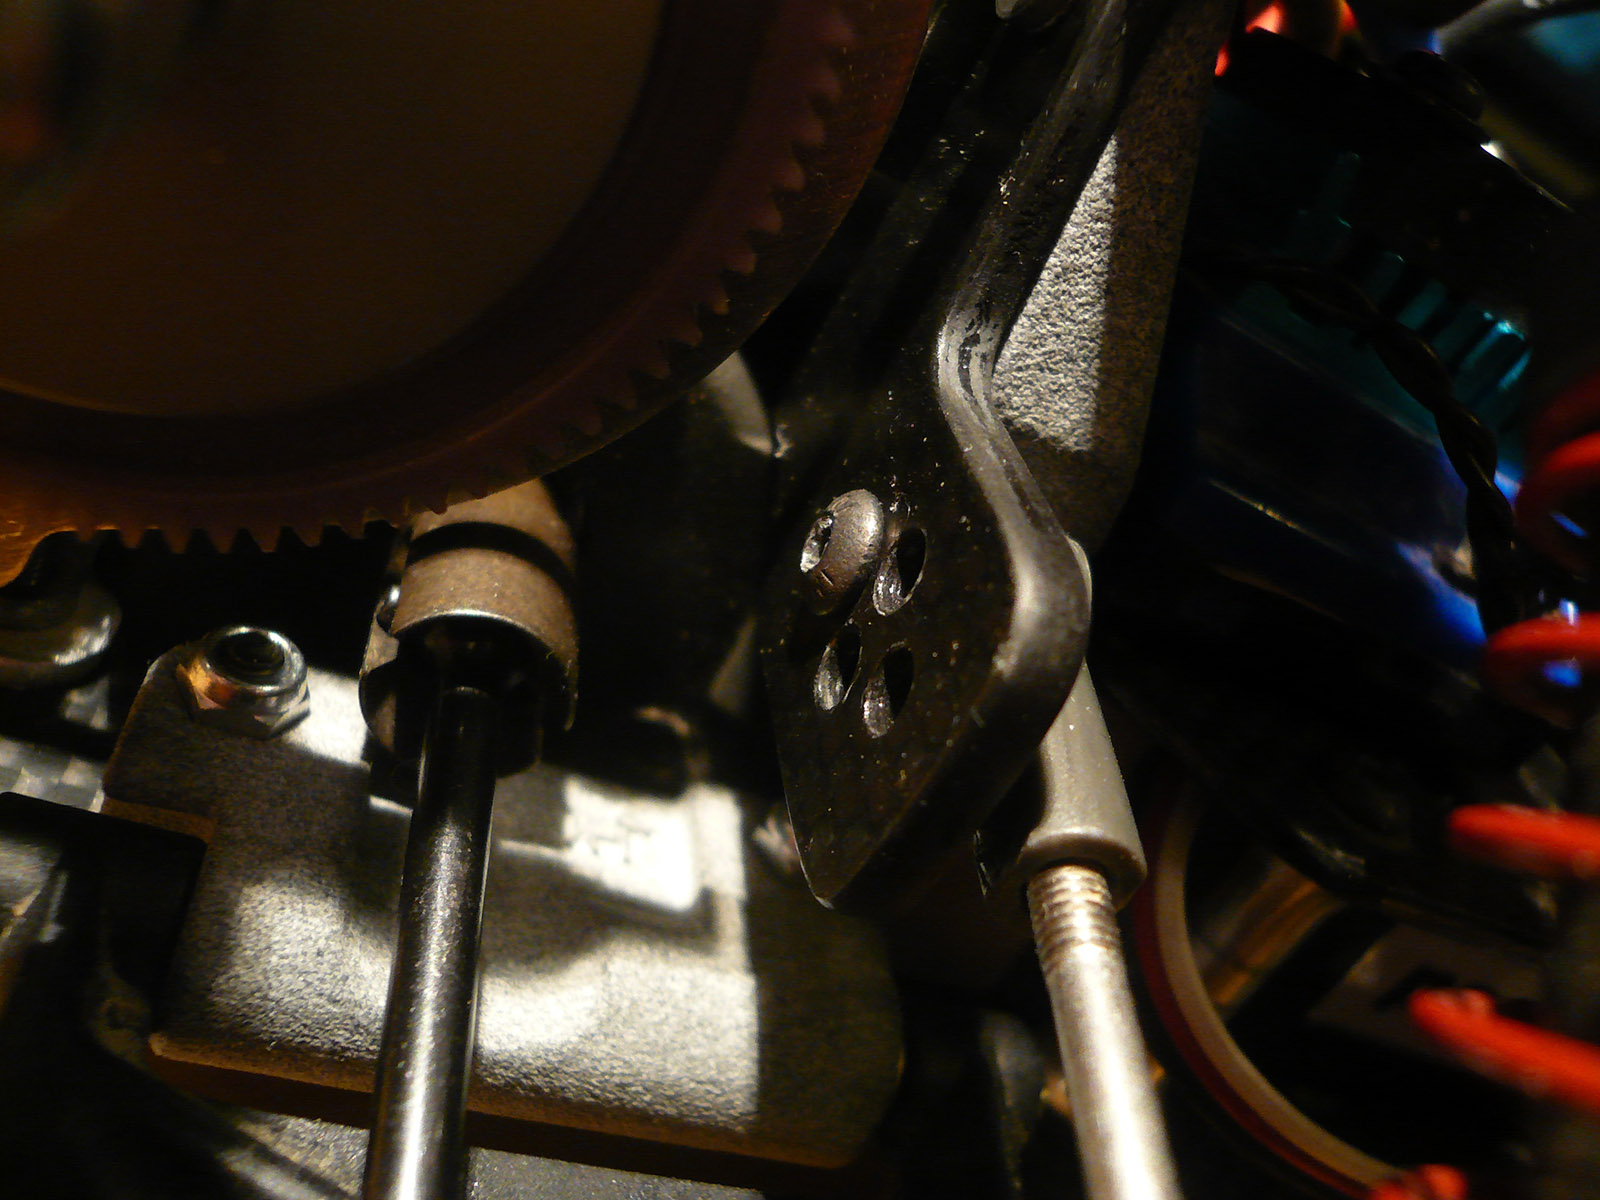 tamiya wrenchdog dyna storm dyna blaster custom rear damper stay